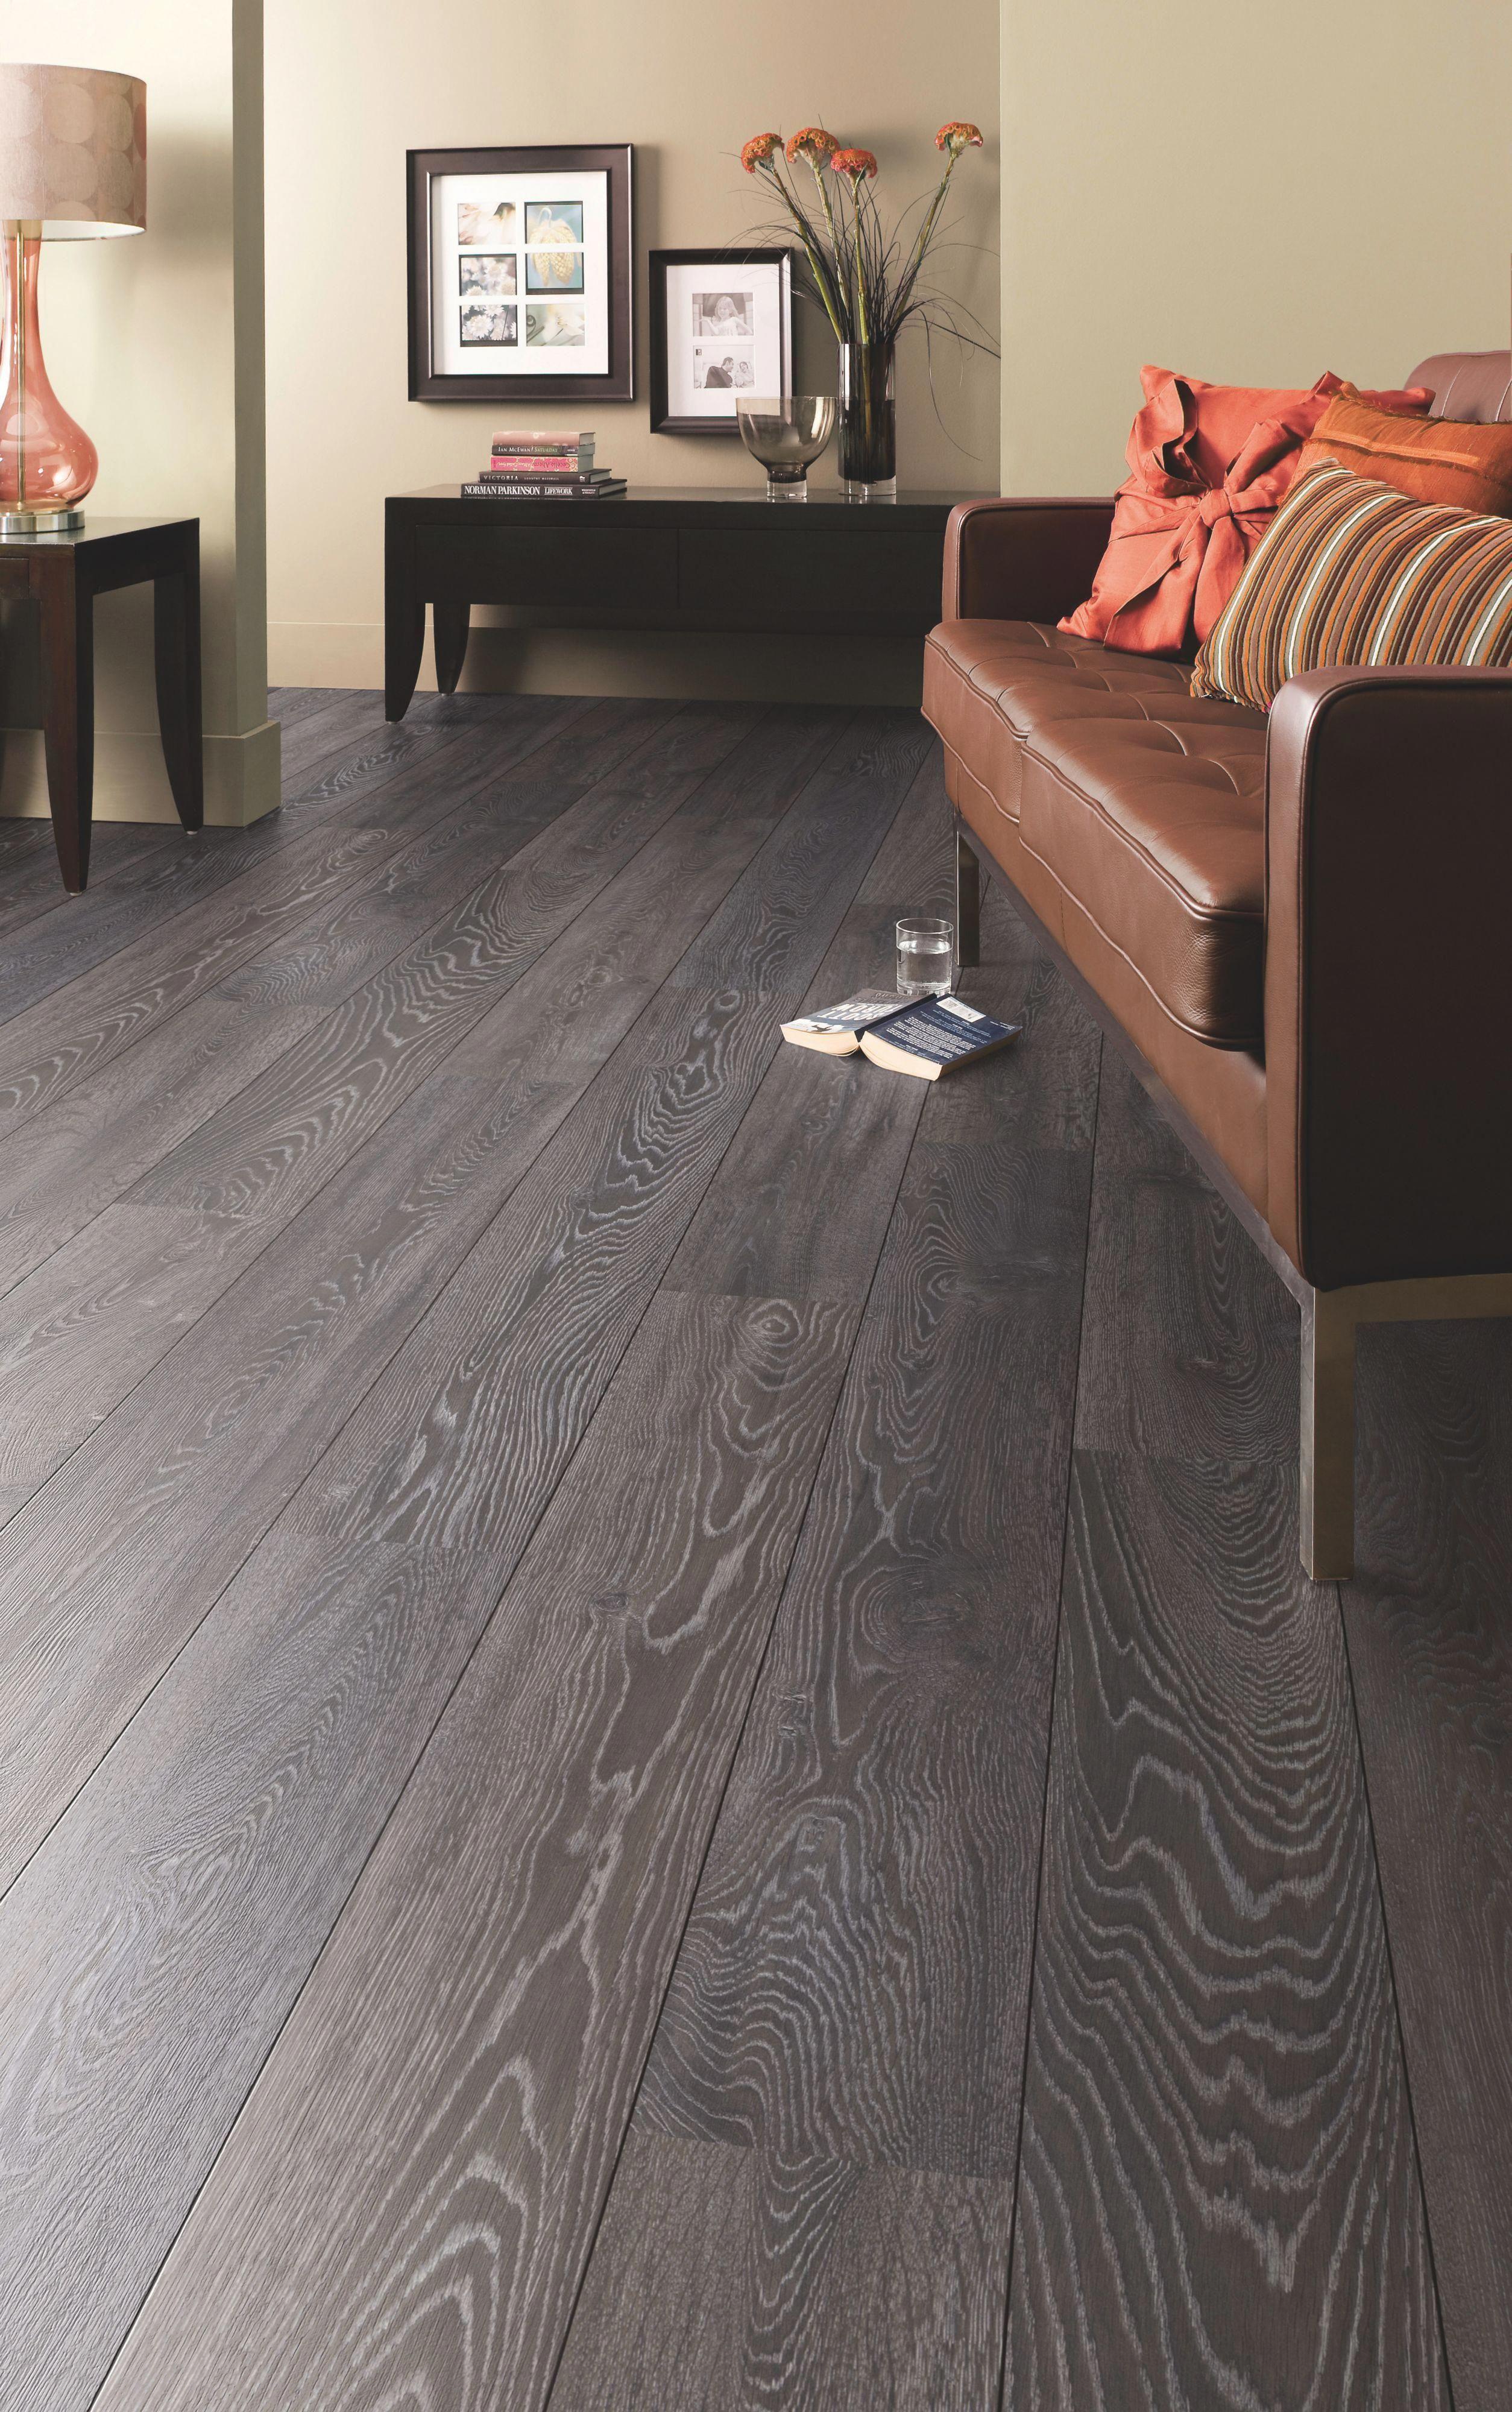 Bodrum Grey Wood Effect Laminate Flooring 2 13 M Pack Departments Diy At B Grey Laminate Flooring Living Room Grey Laminate Flooring Oak Laminate Flooring